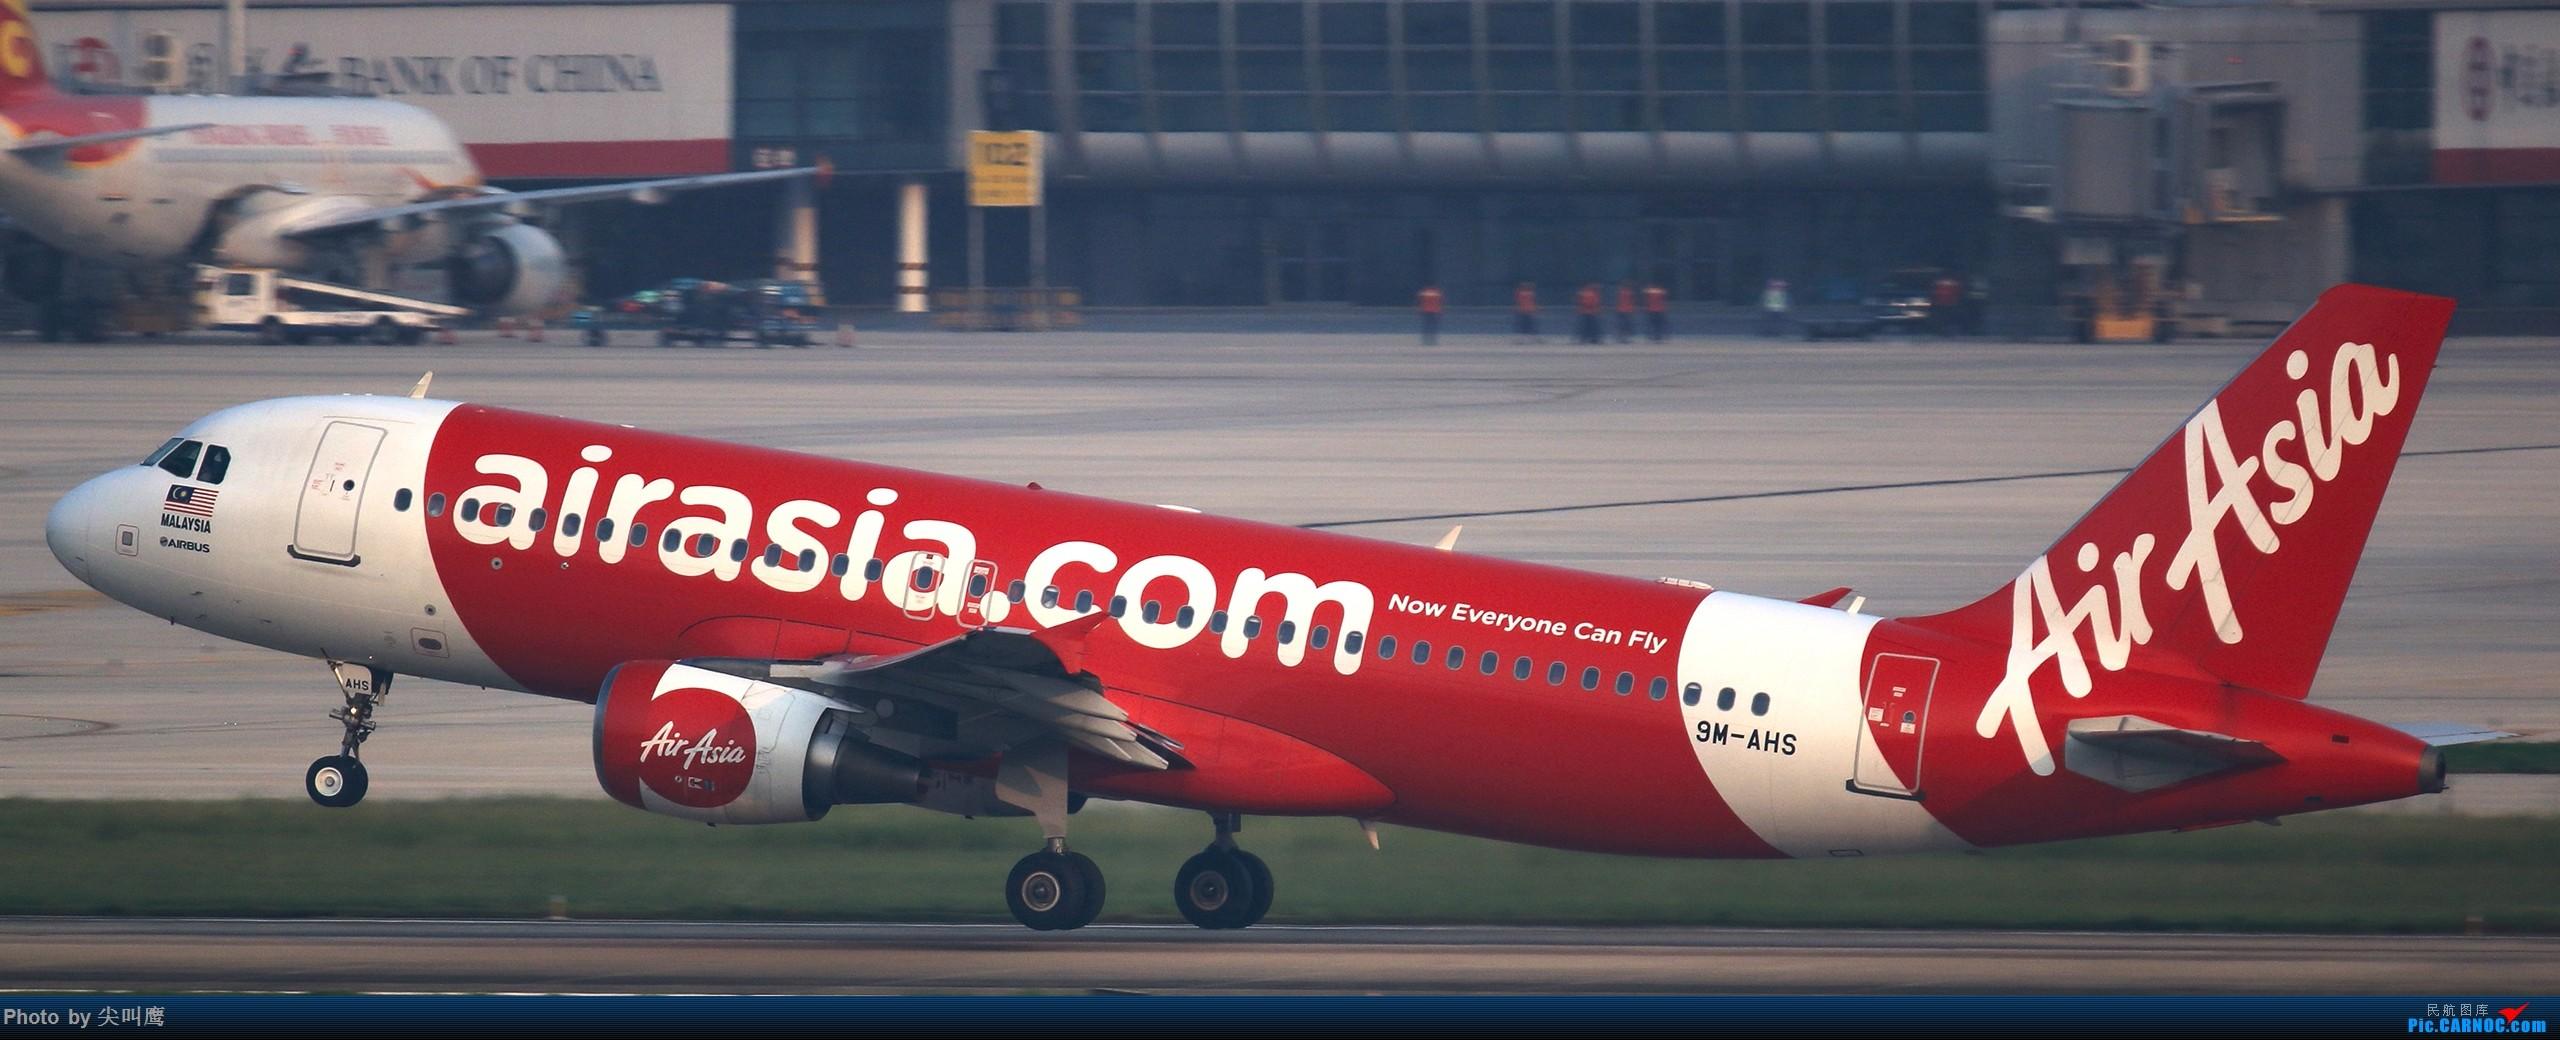 Re:[原创]NNG的亚航小合集 AIRBUS A320 9M-AHS 中国南宁吴圩国际机场